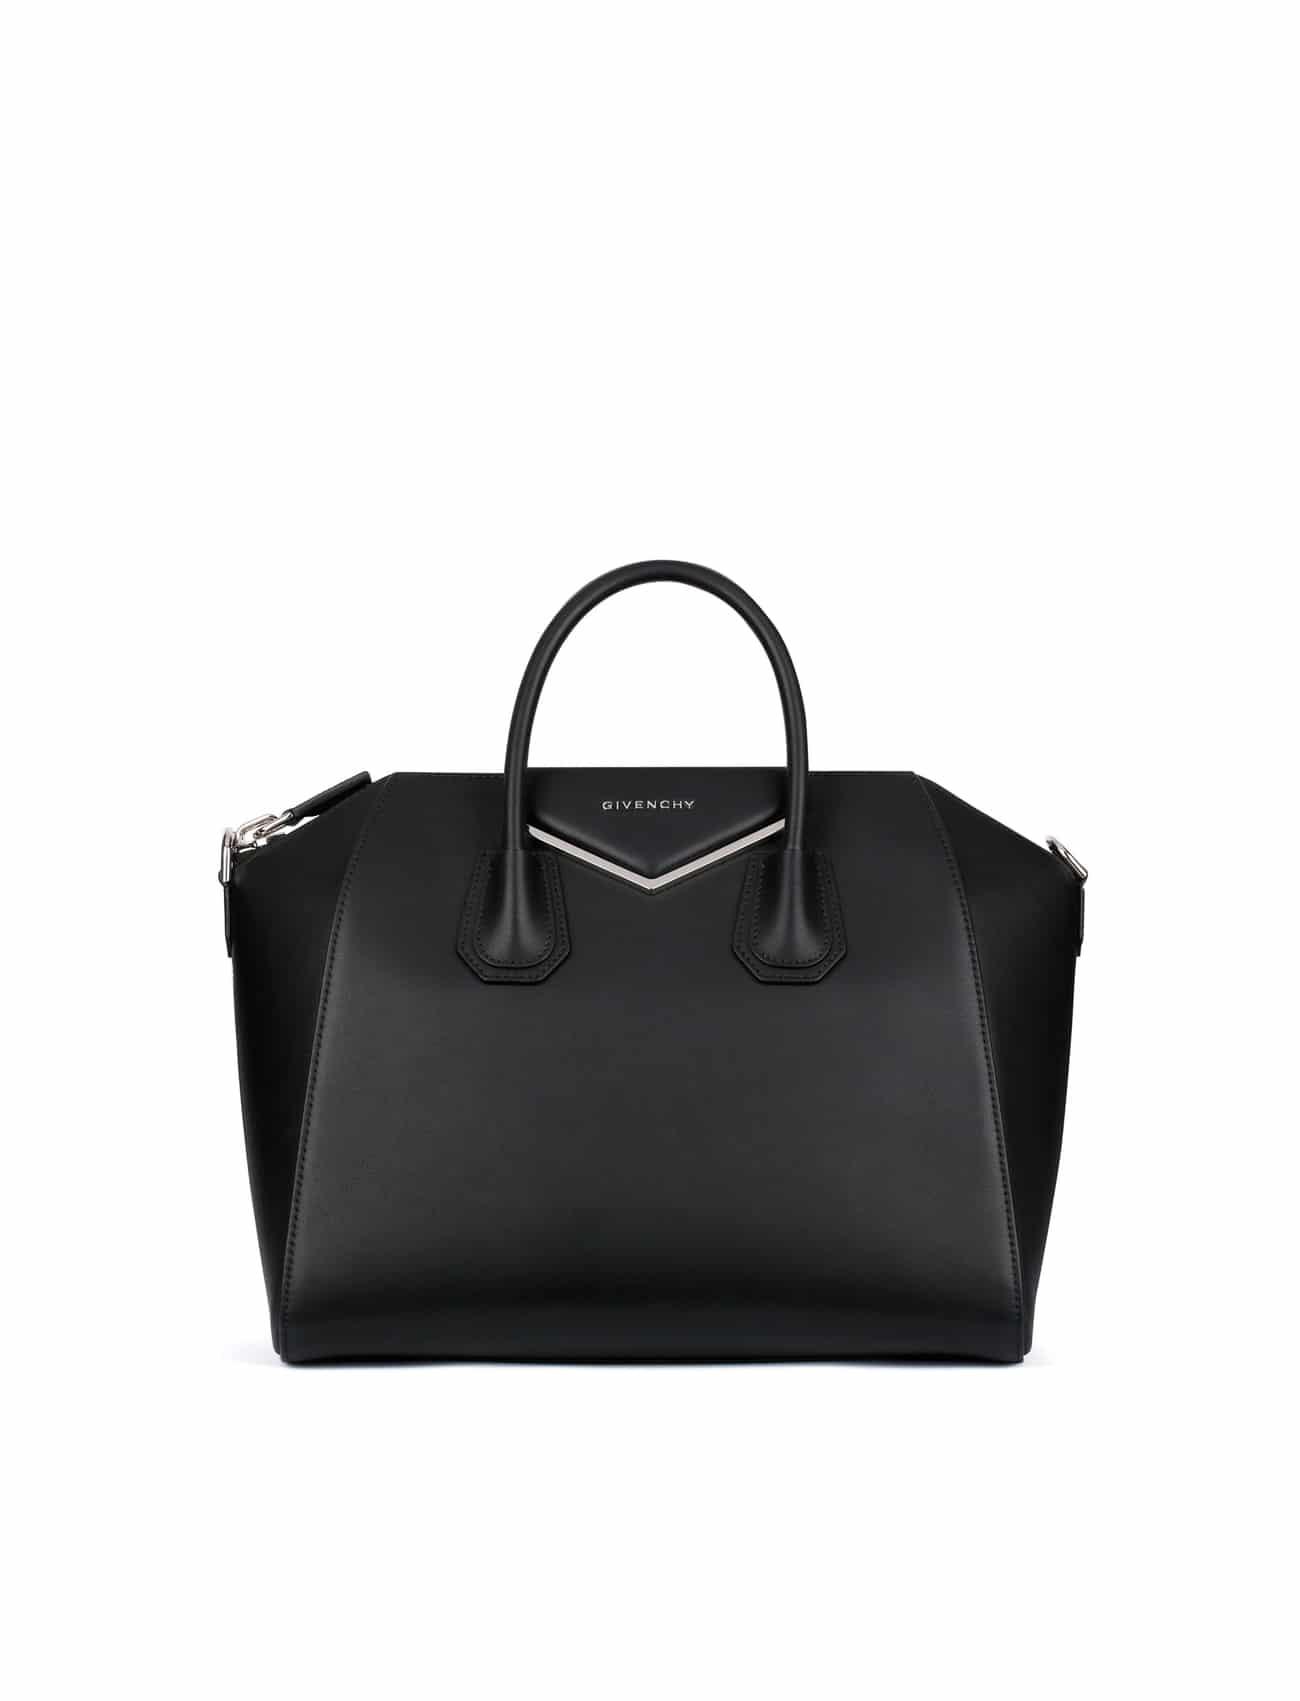 ab601ddfb9 Givenchy Black Medium Antigona Bag with Metal Details